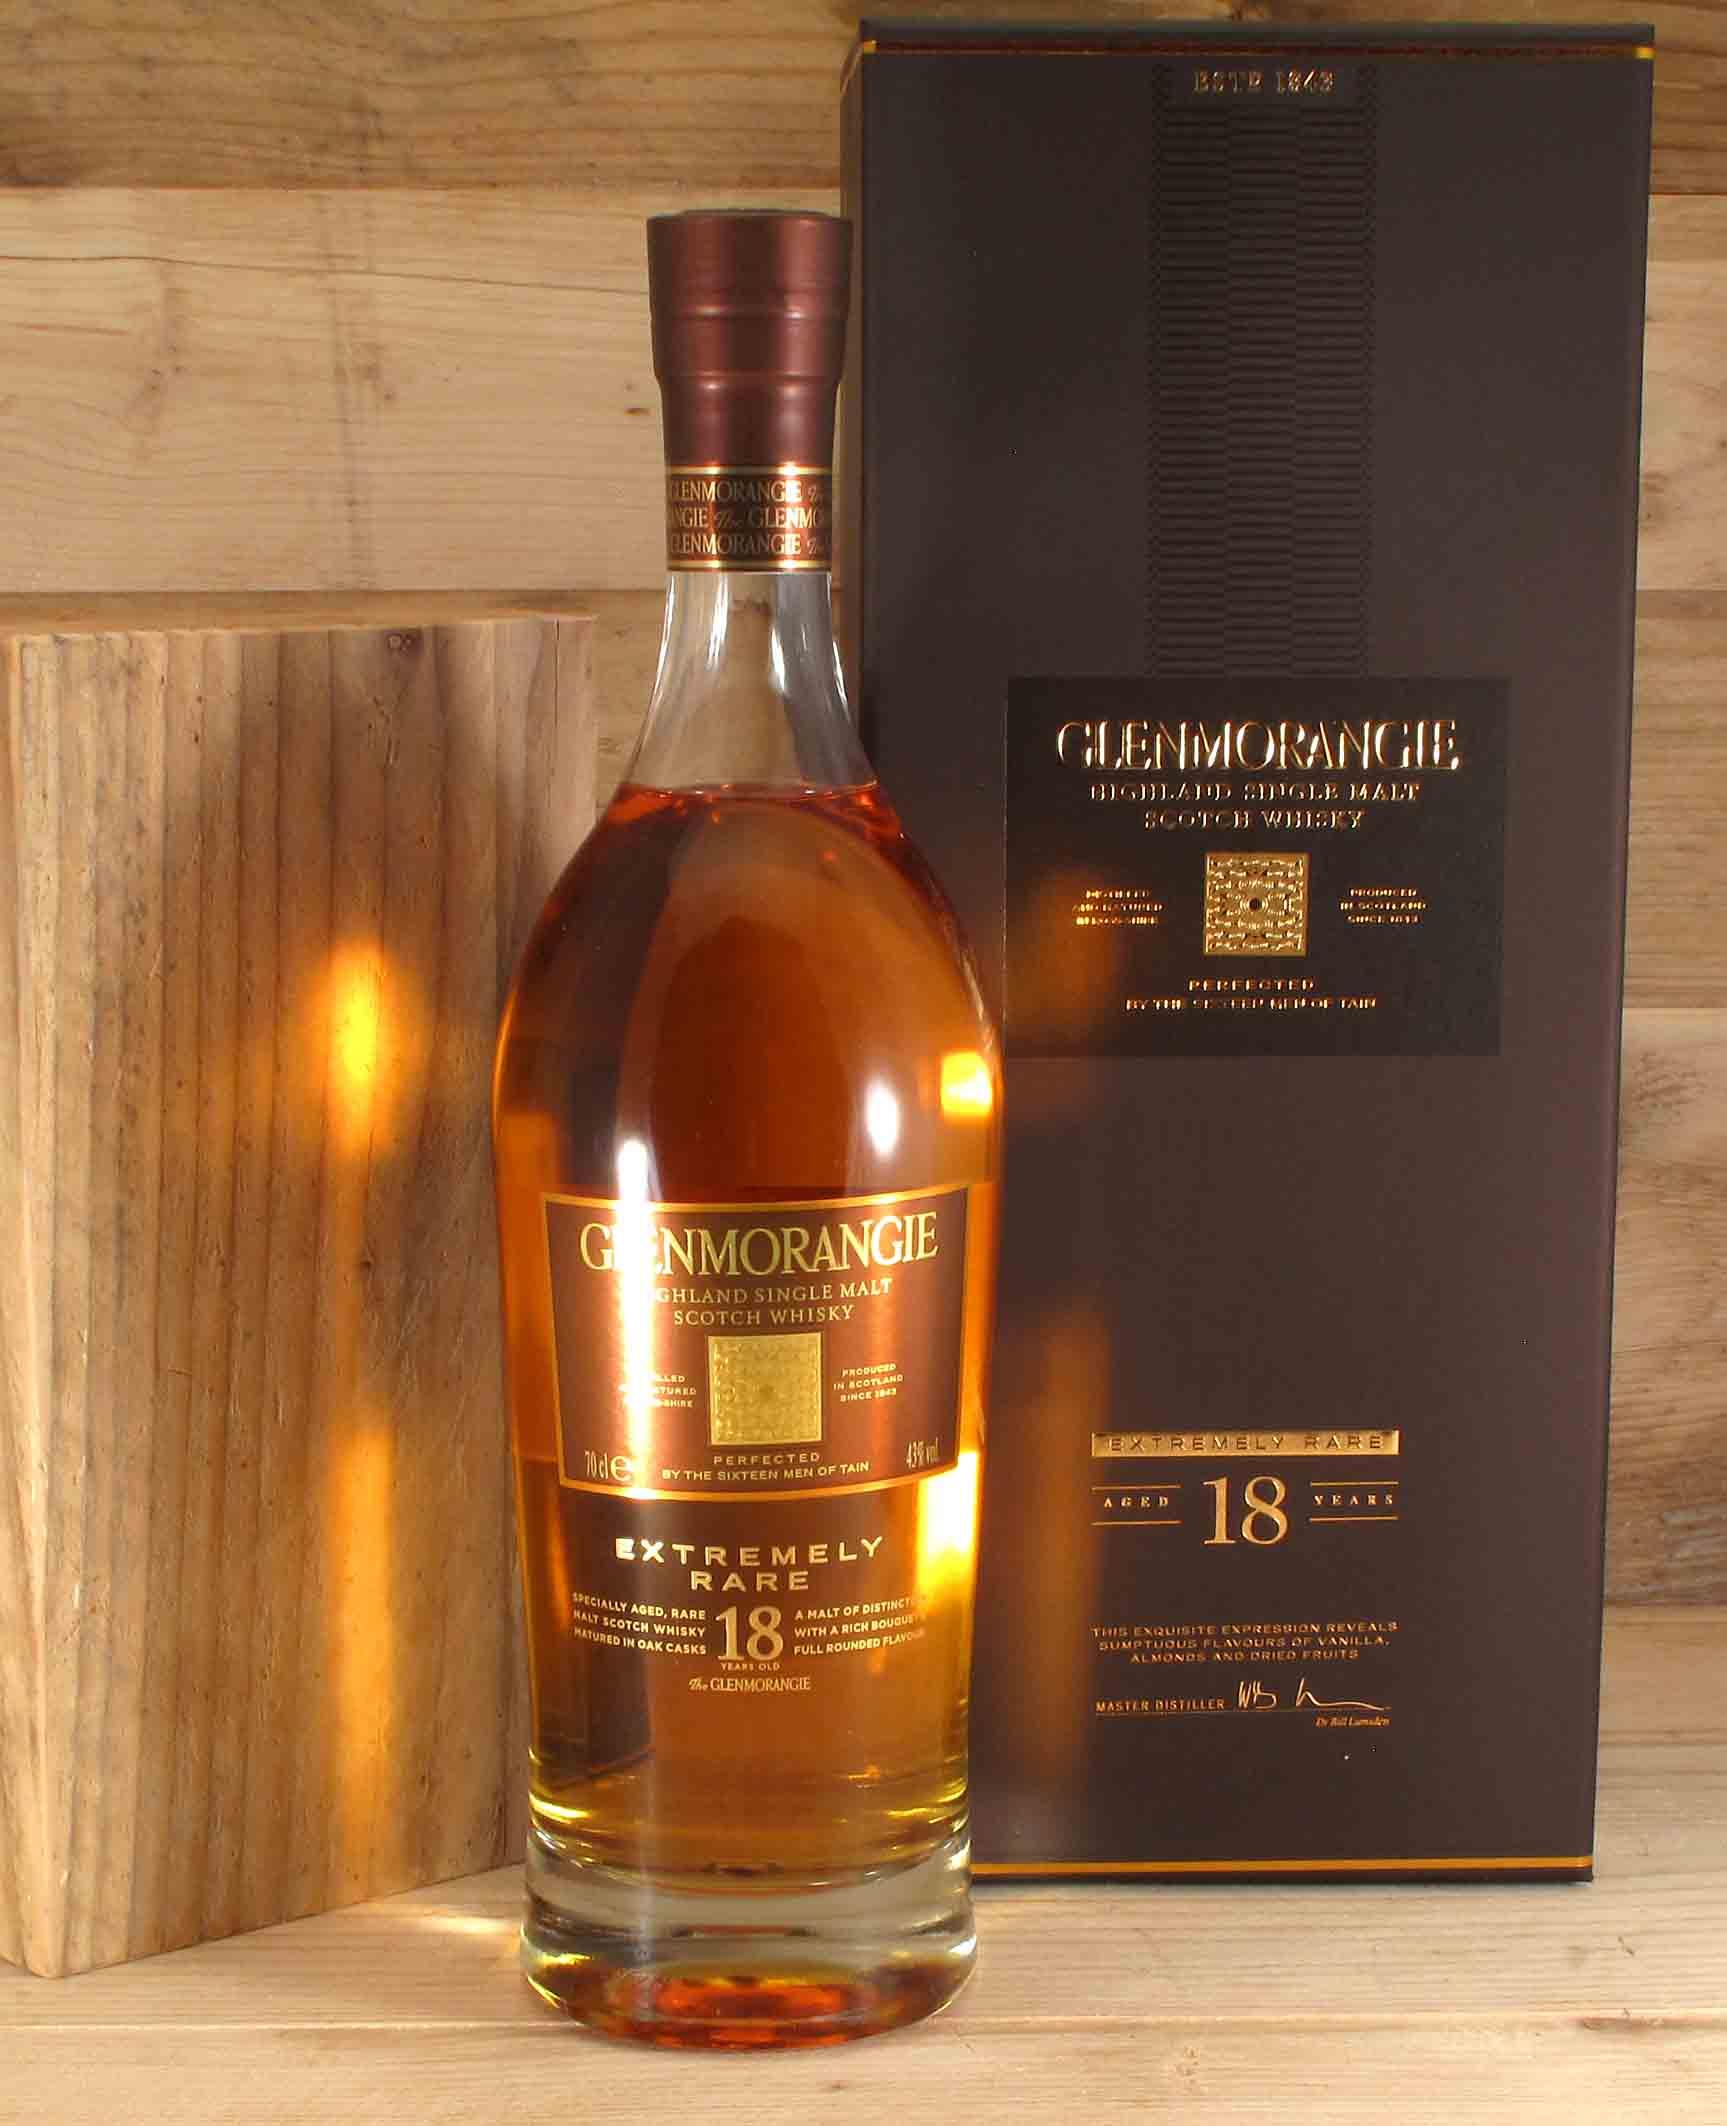 Glenmorangie Extremely Rare 18 Years Scotch Whisky | viel fein [feel ...